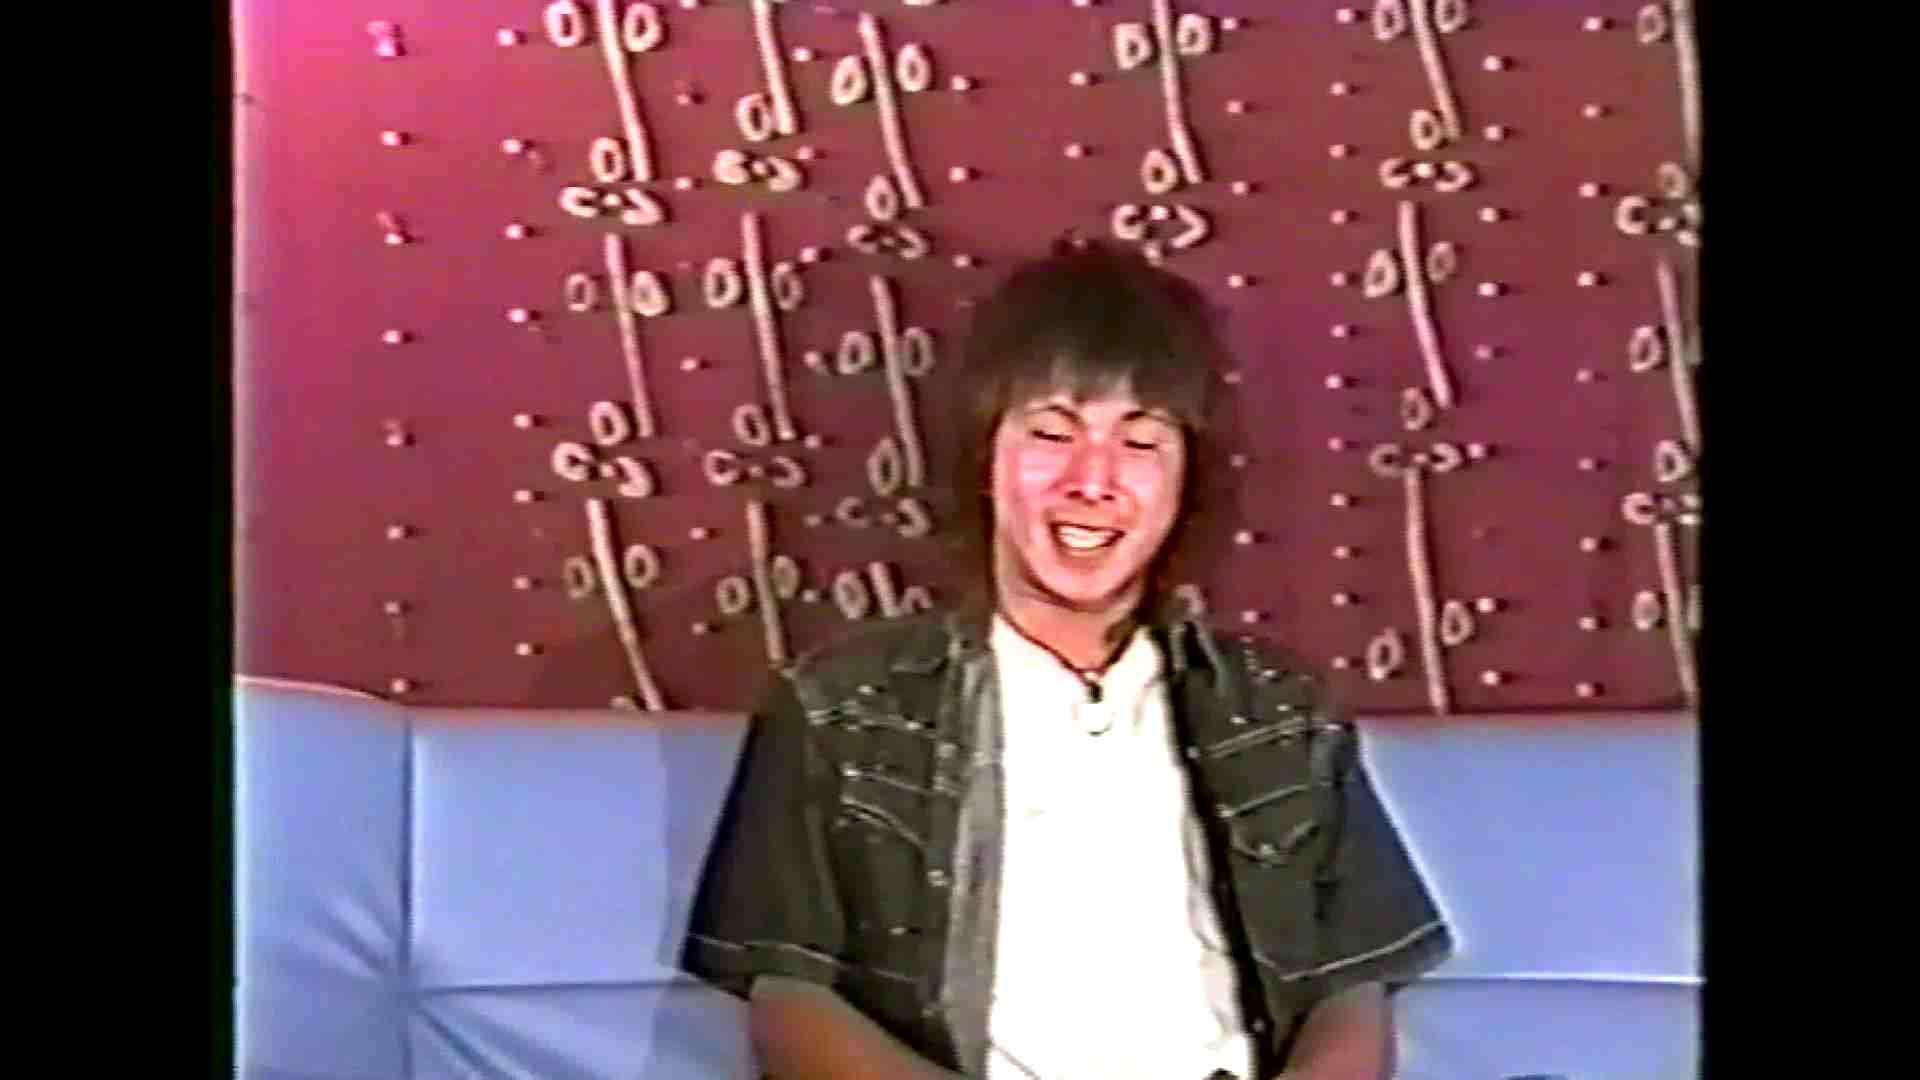 GAYBOY宏のオカズ倉庫Vol.3-1 GAY ゲイセックス画像 103画像 43